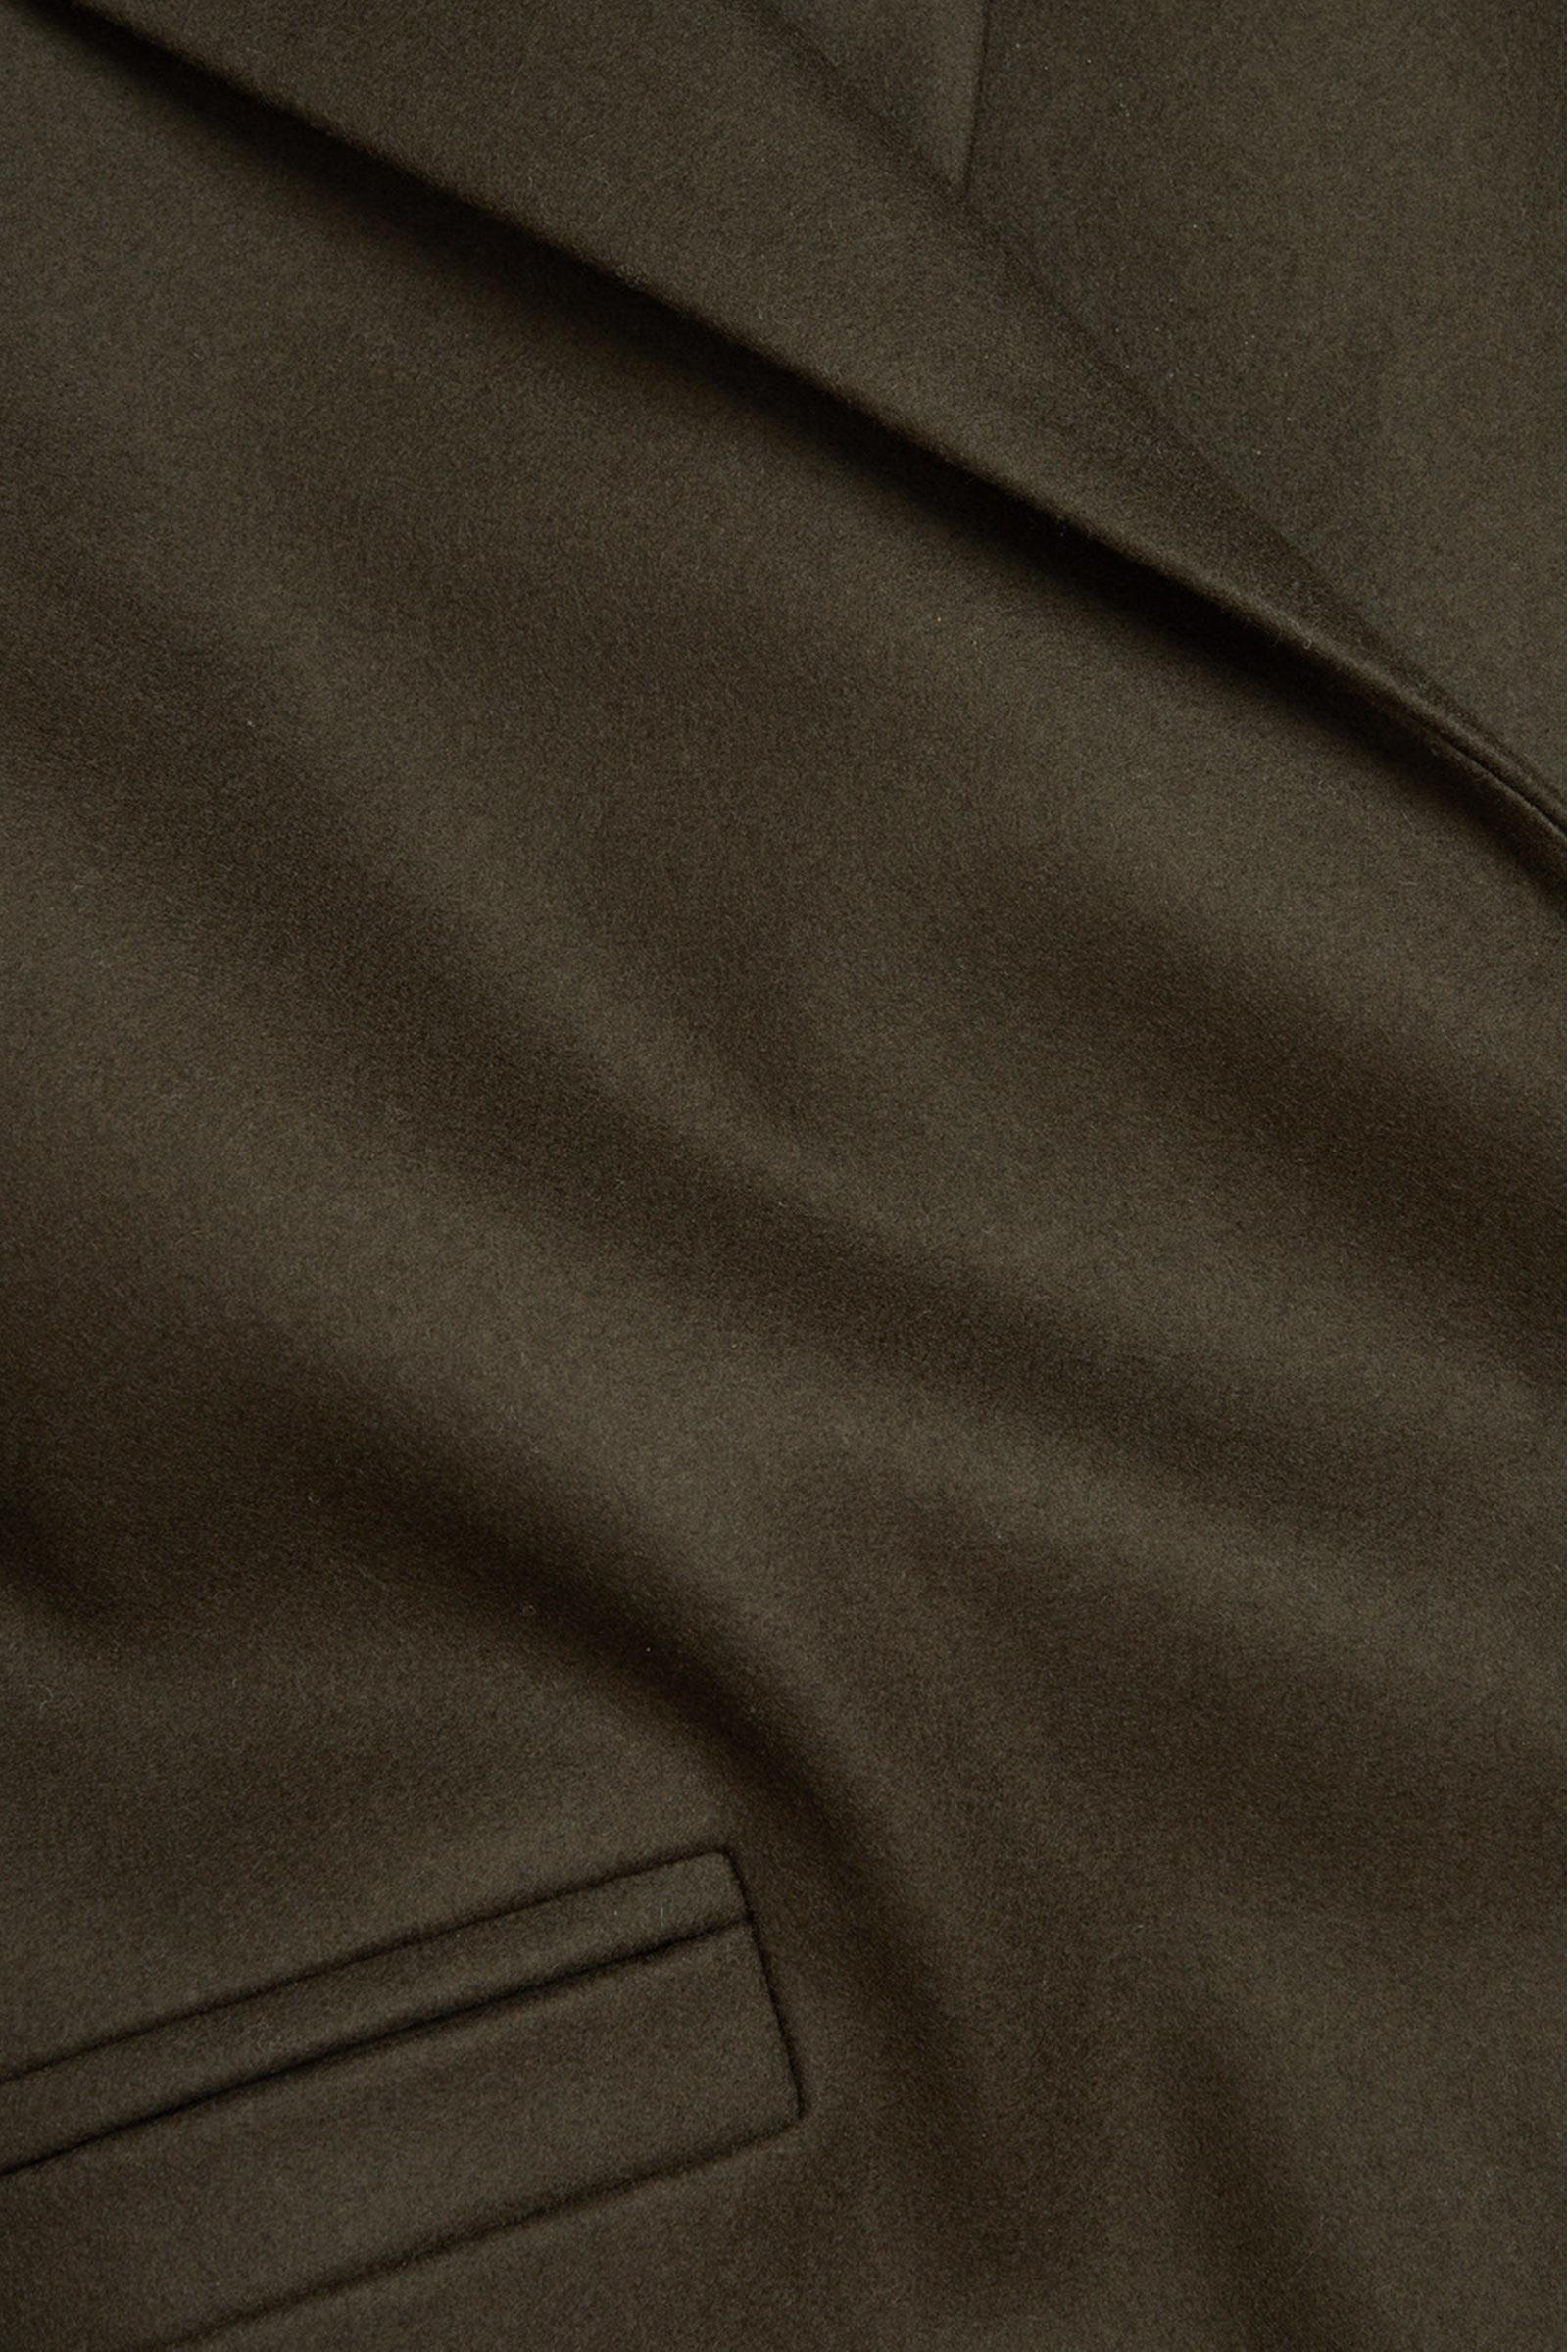 COS 울 믹스 오버사이즈 라펠 롱 코트의 다크 브라운컬러 Detail입니다.